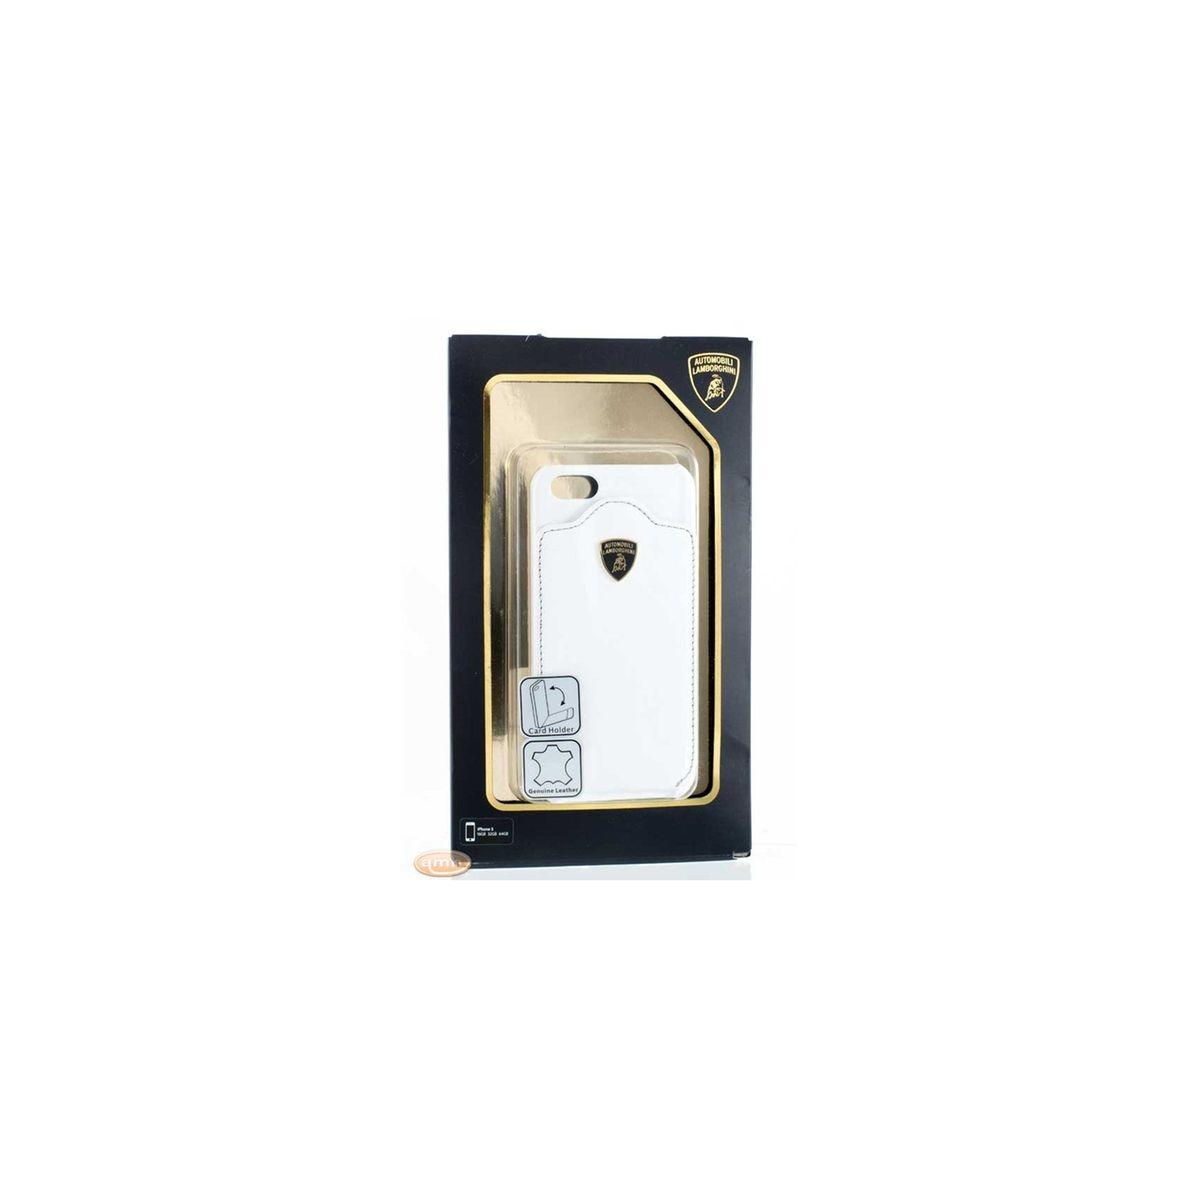 Coque Porte-Carte pour iPhone SE LAMBORGHINI 'DIABLO' Cuir Blanc